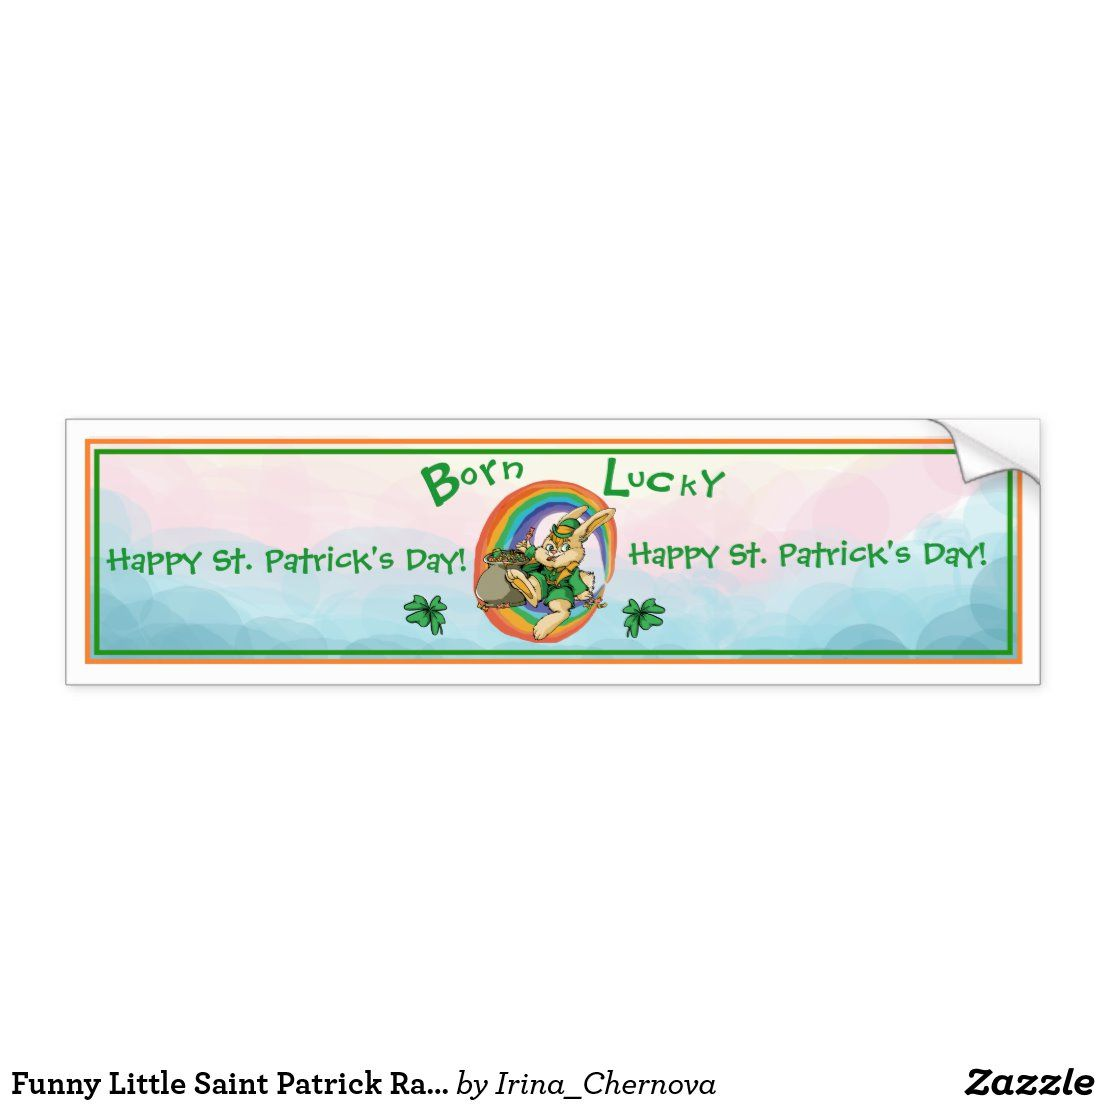 Funny Little Saint Patrick Rabbit Bumper Sticker Bumper Stickers Bumpers Custom Stickers [ 1106 x 1106 Pixel ]